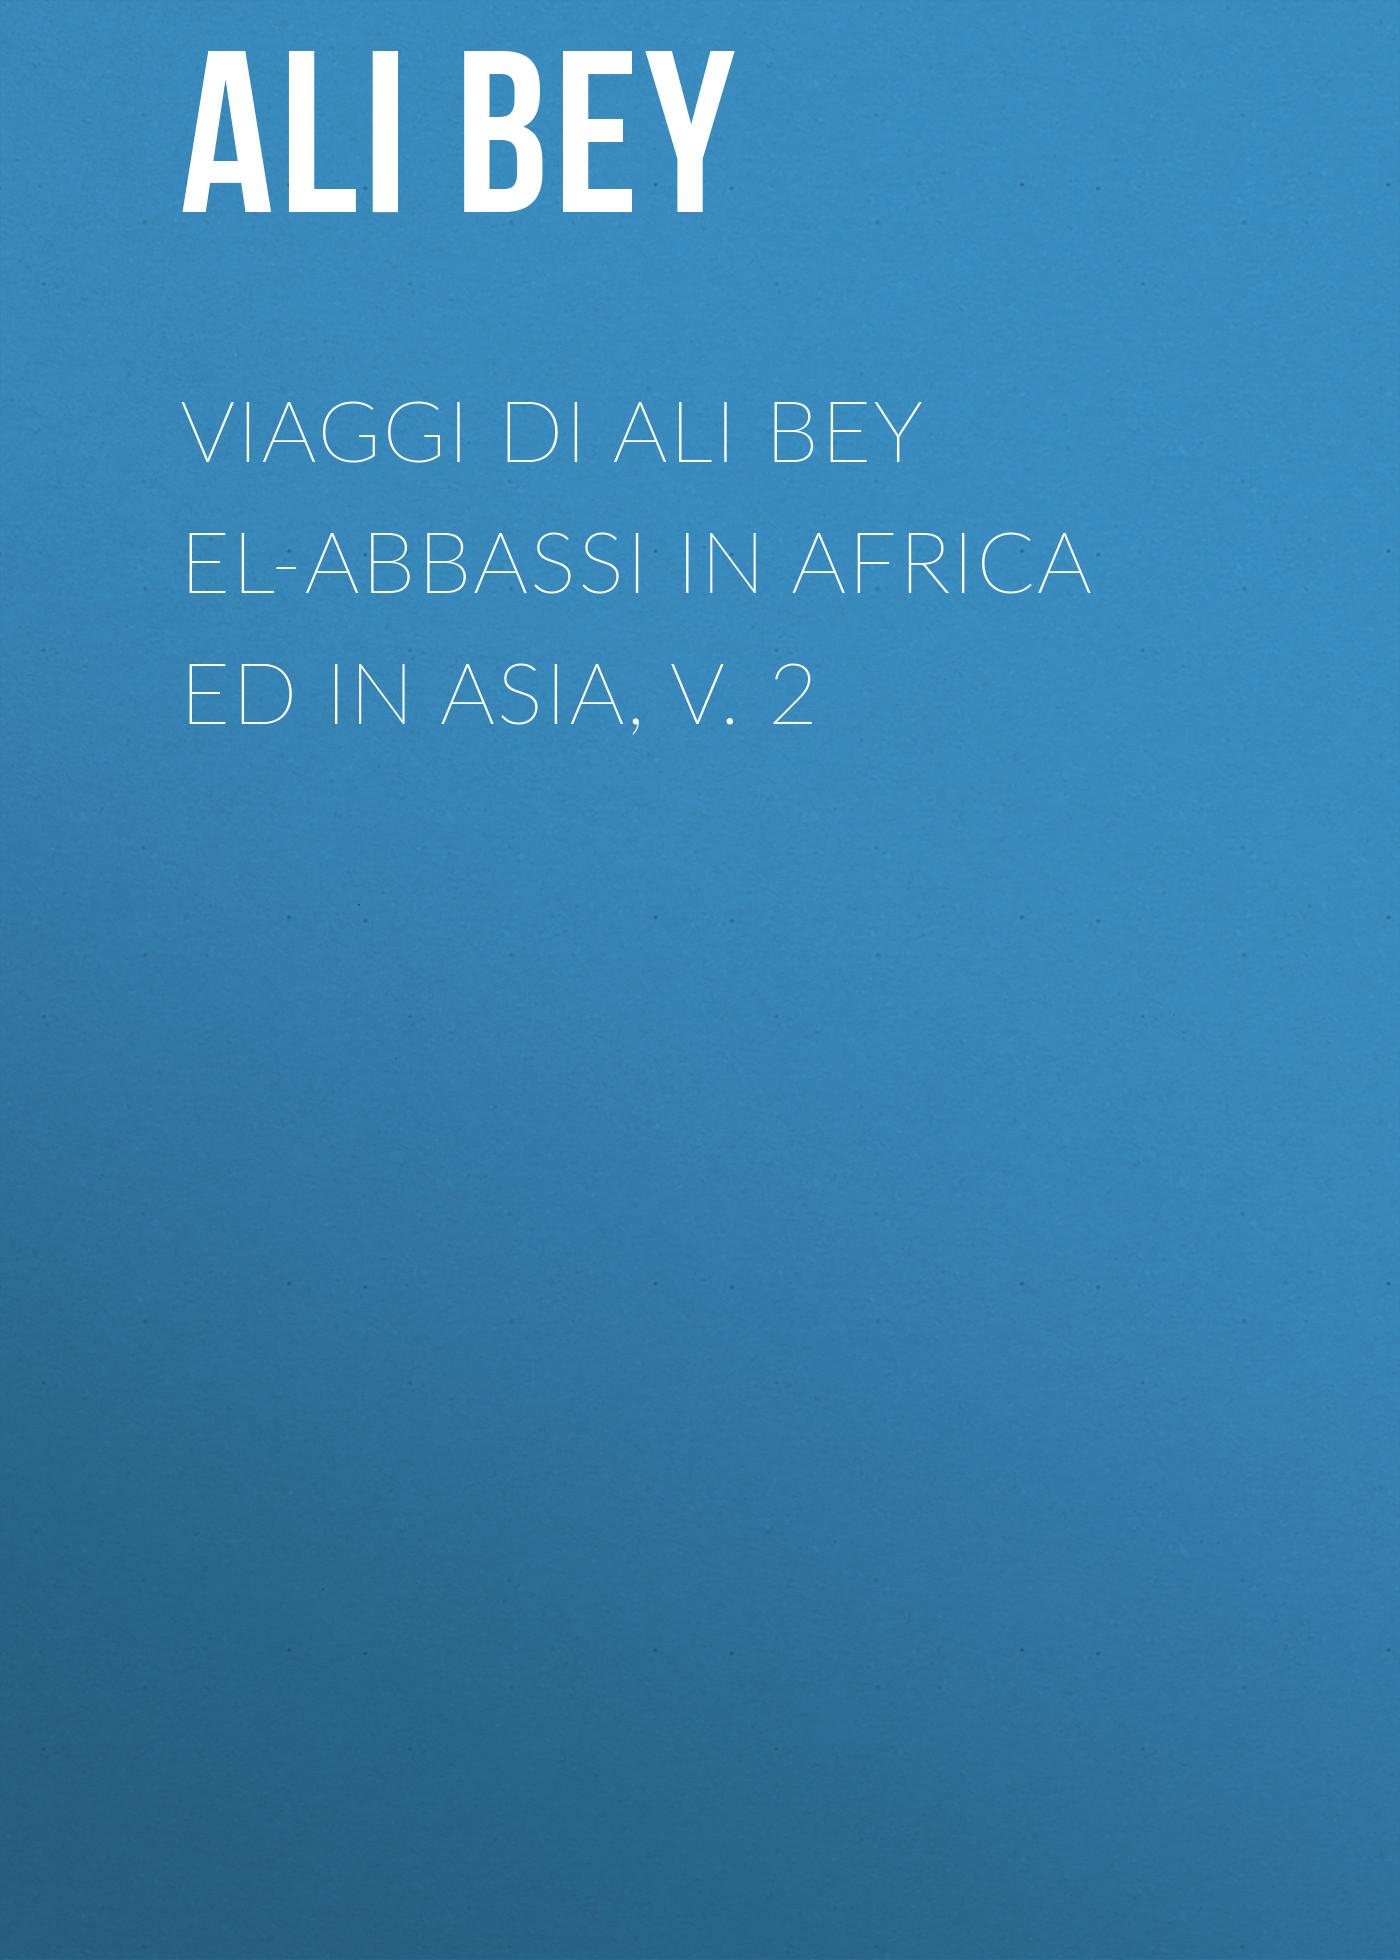 Ali Bey Viaggi di Ali Bey el-Abbassi in Africa ed in Asia, v. 2 dawoud bey